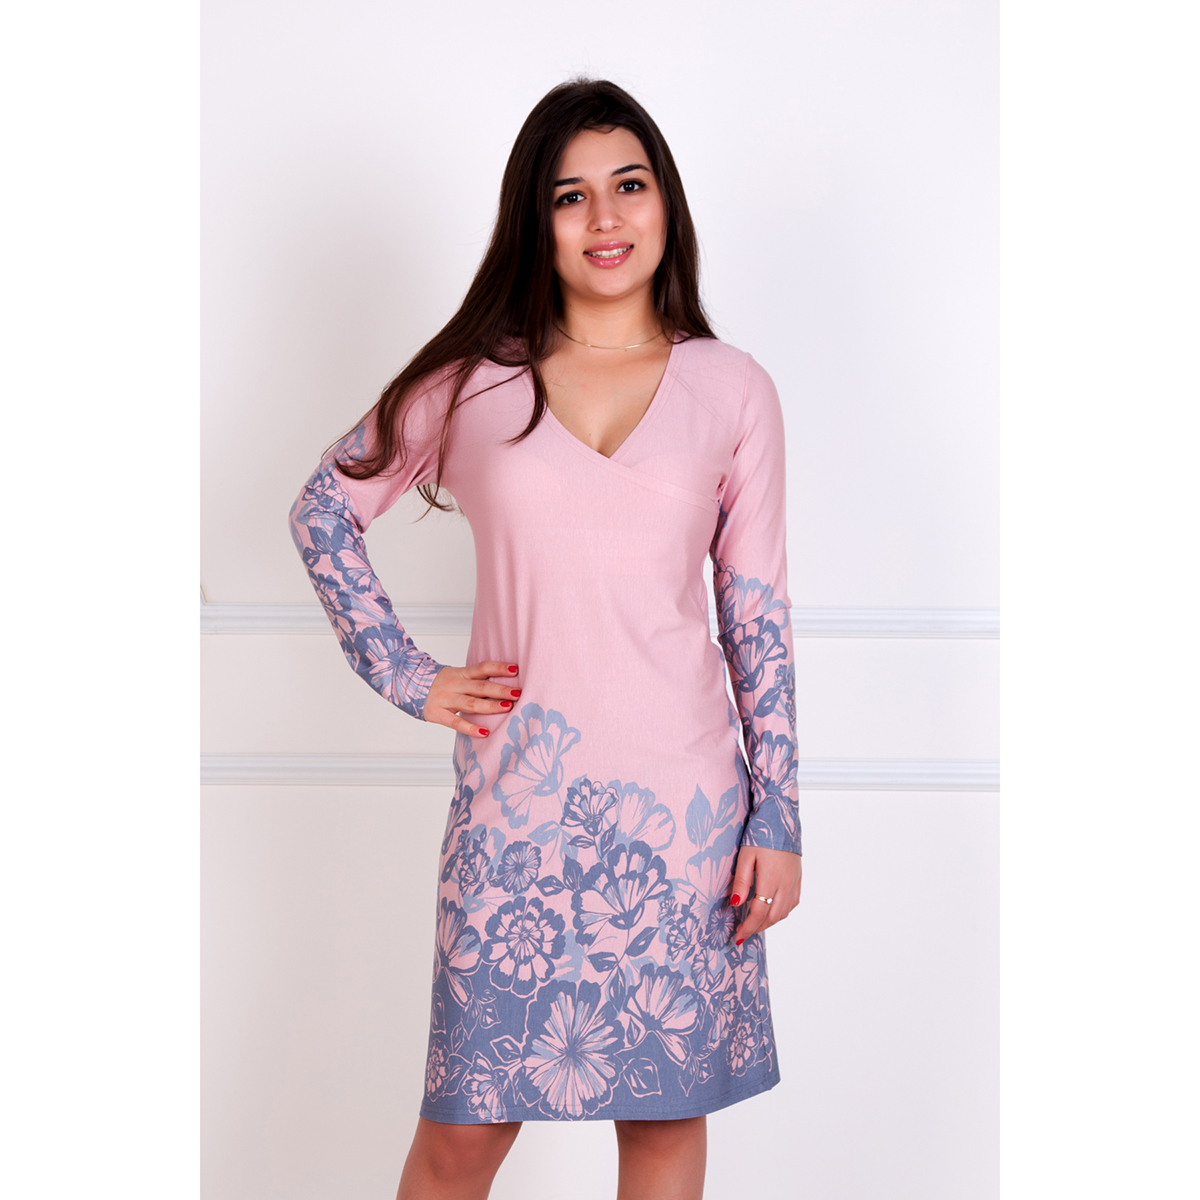 Женское платье Роберта, размер 42Платья, туники<br>Обхват груди:84 см<br>Обхват талии:65 см<br>Обхват бедер:92 см<br>Рост:167 см<br><br>Тип: Жен. платье<br>Размер: 42<br>Материал: Вискоза